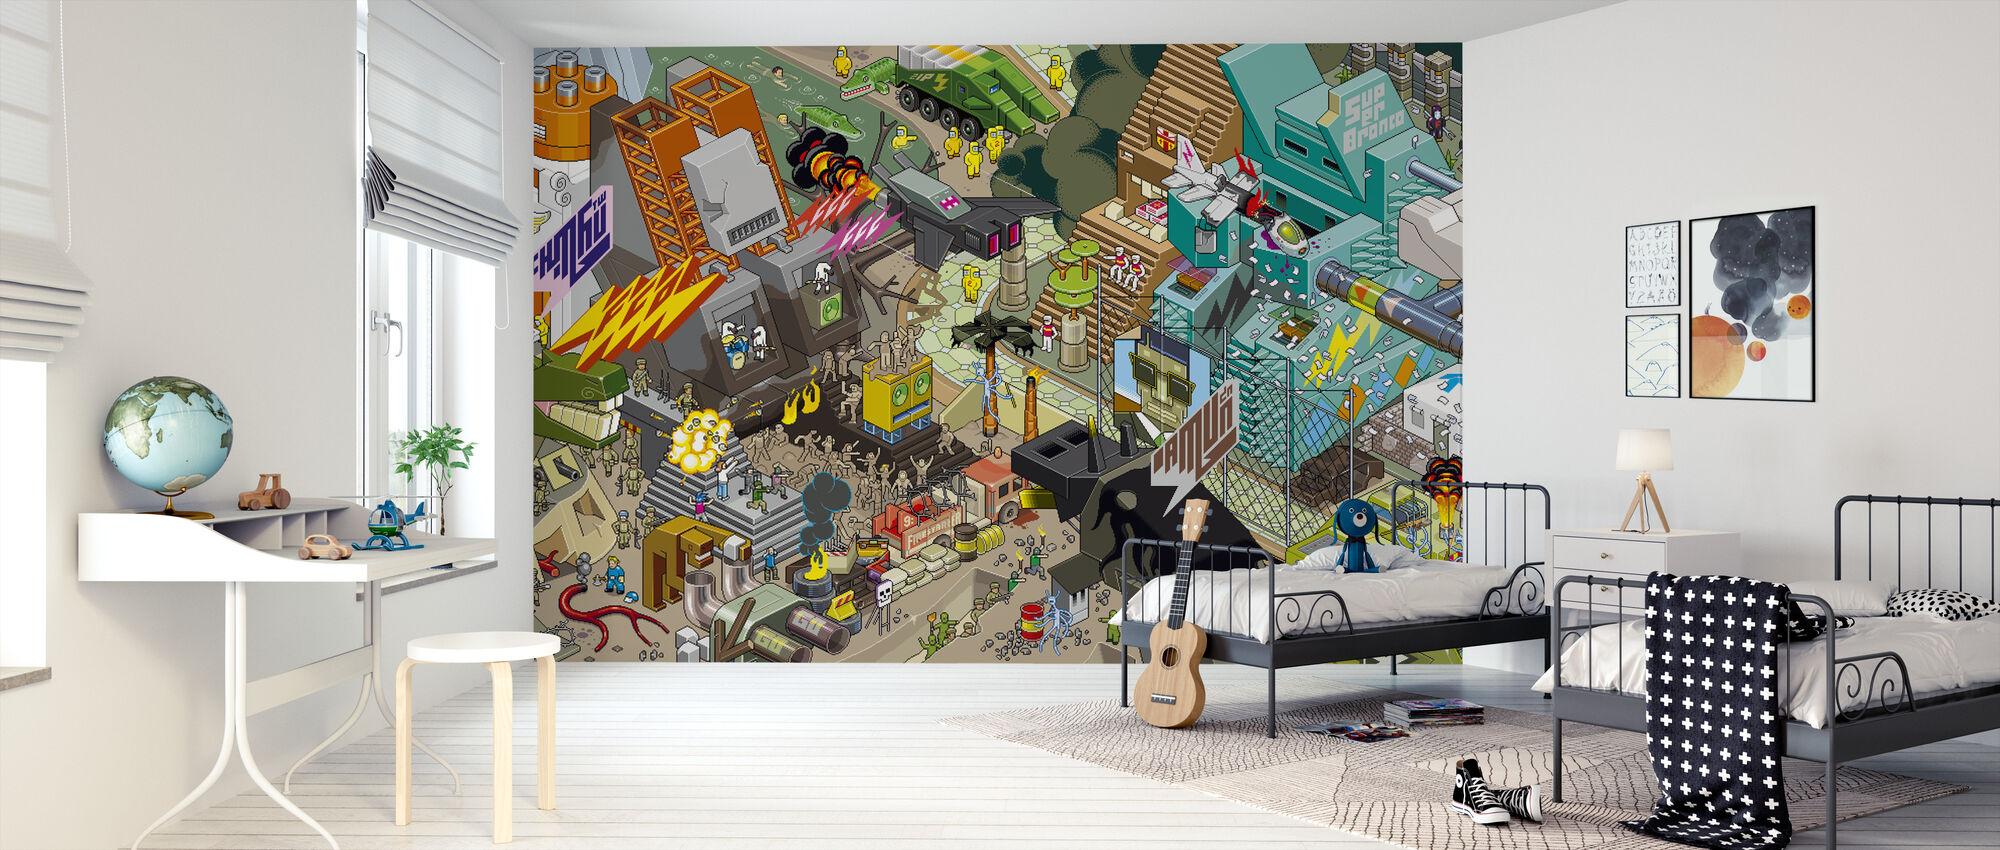 eBoy - Mxl Inka - Wallpaper - Kids Room